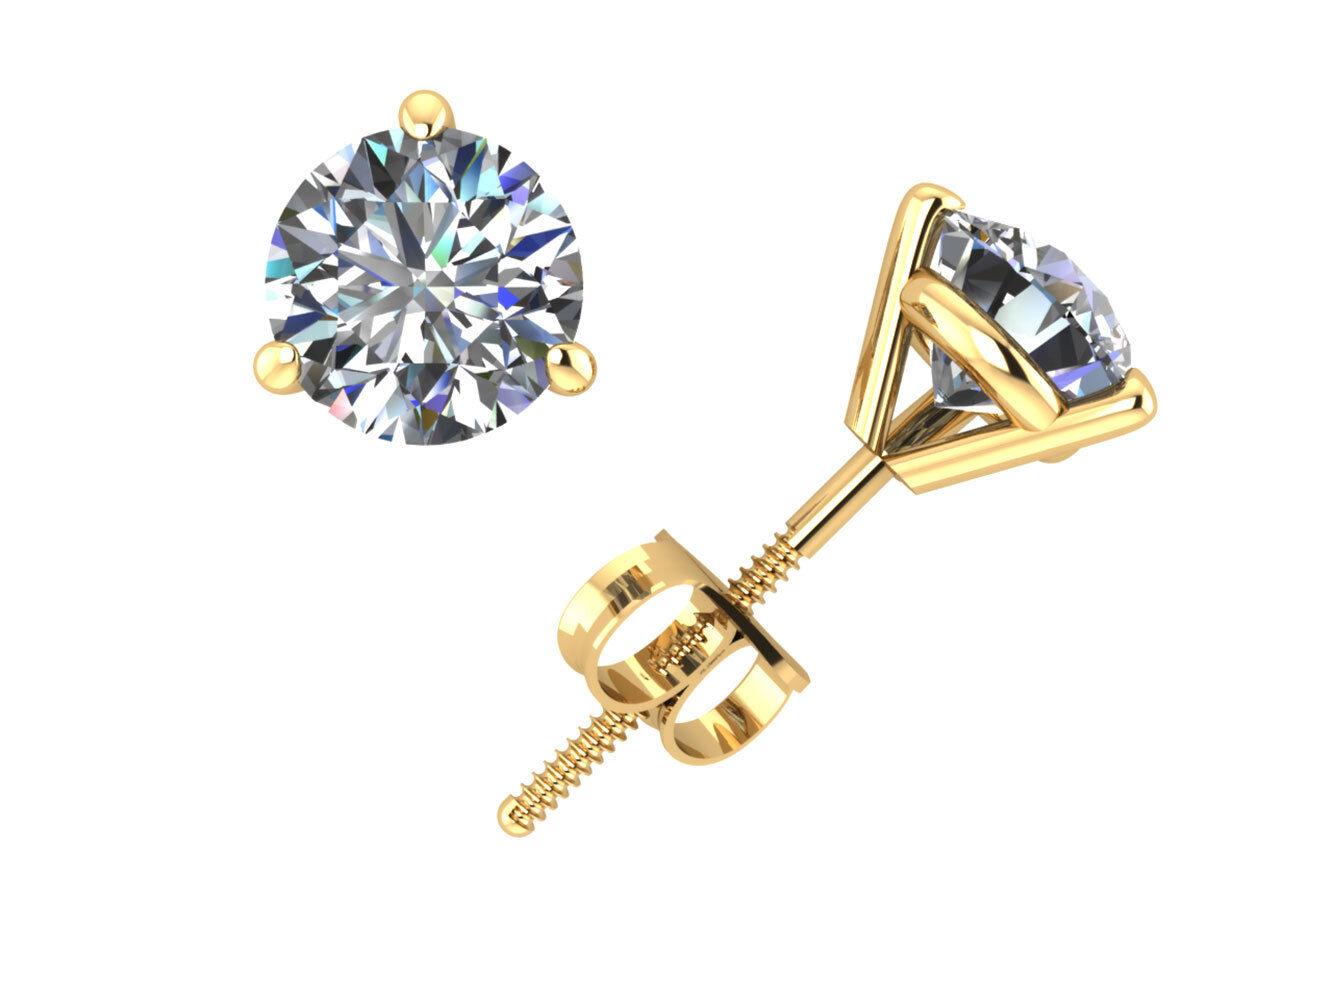 5e188cb3f065d 14k Earrings Stud Solitaire Martini Diamond 0.50Ct Yellow Round I1 J ...